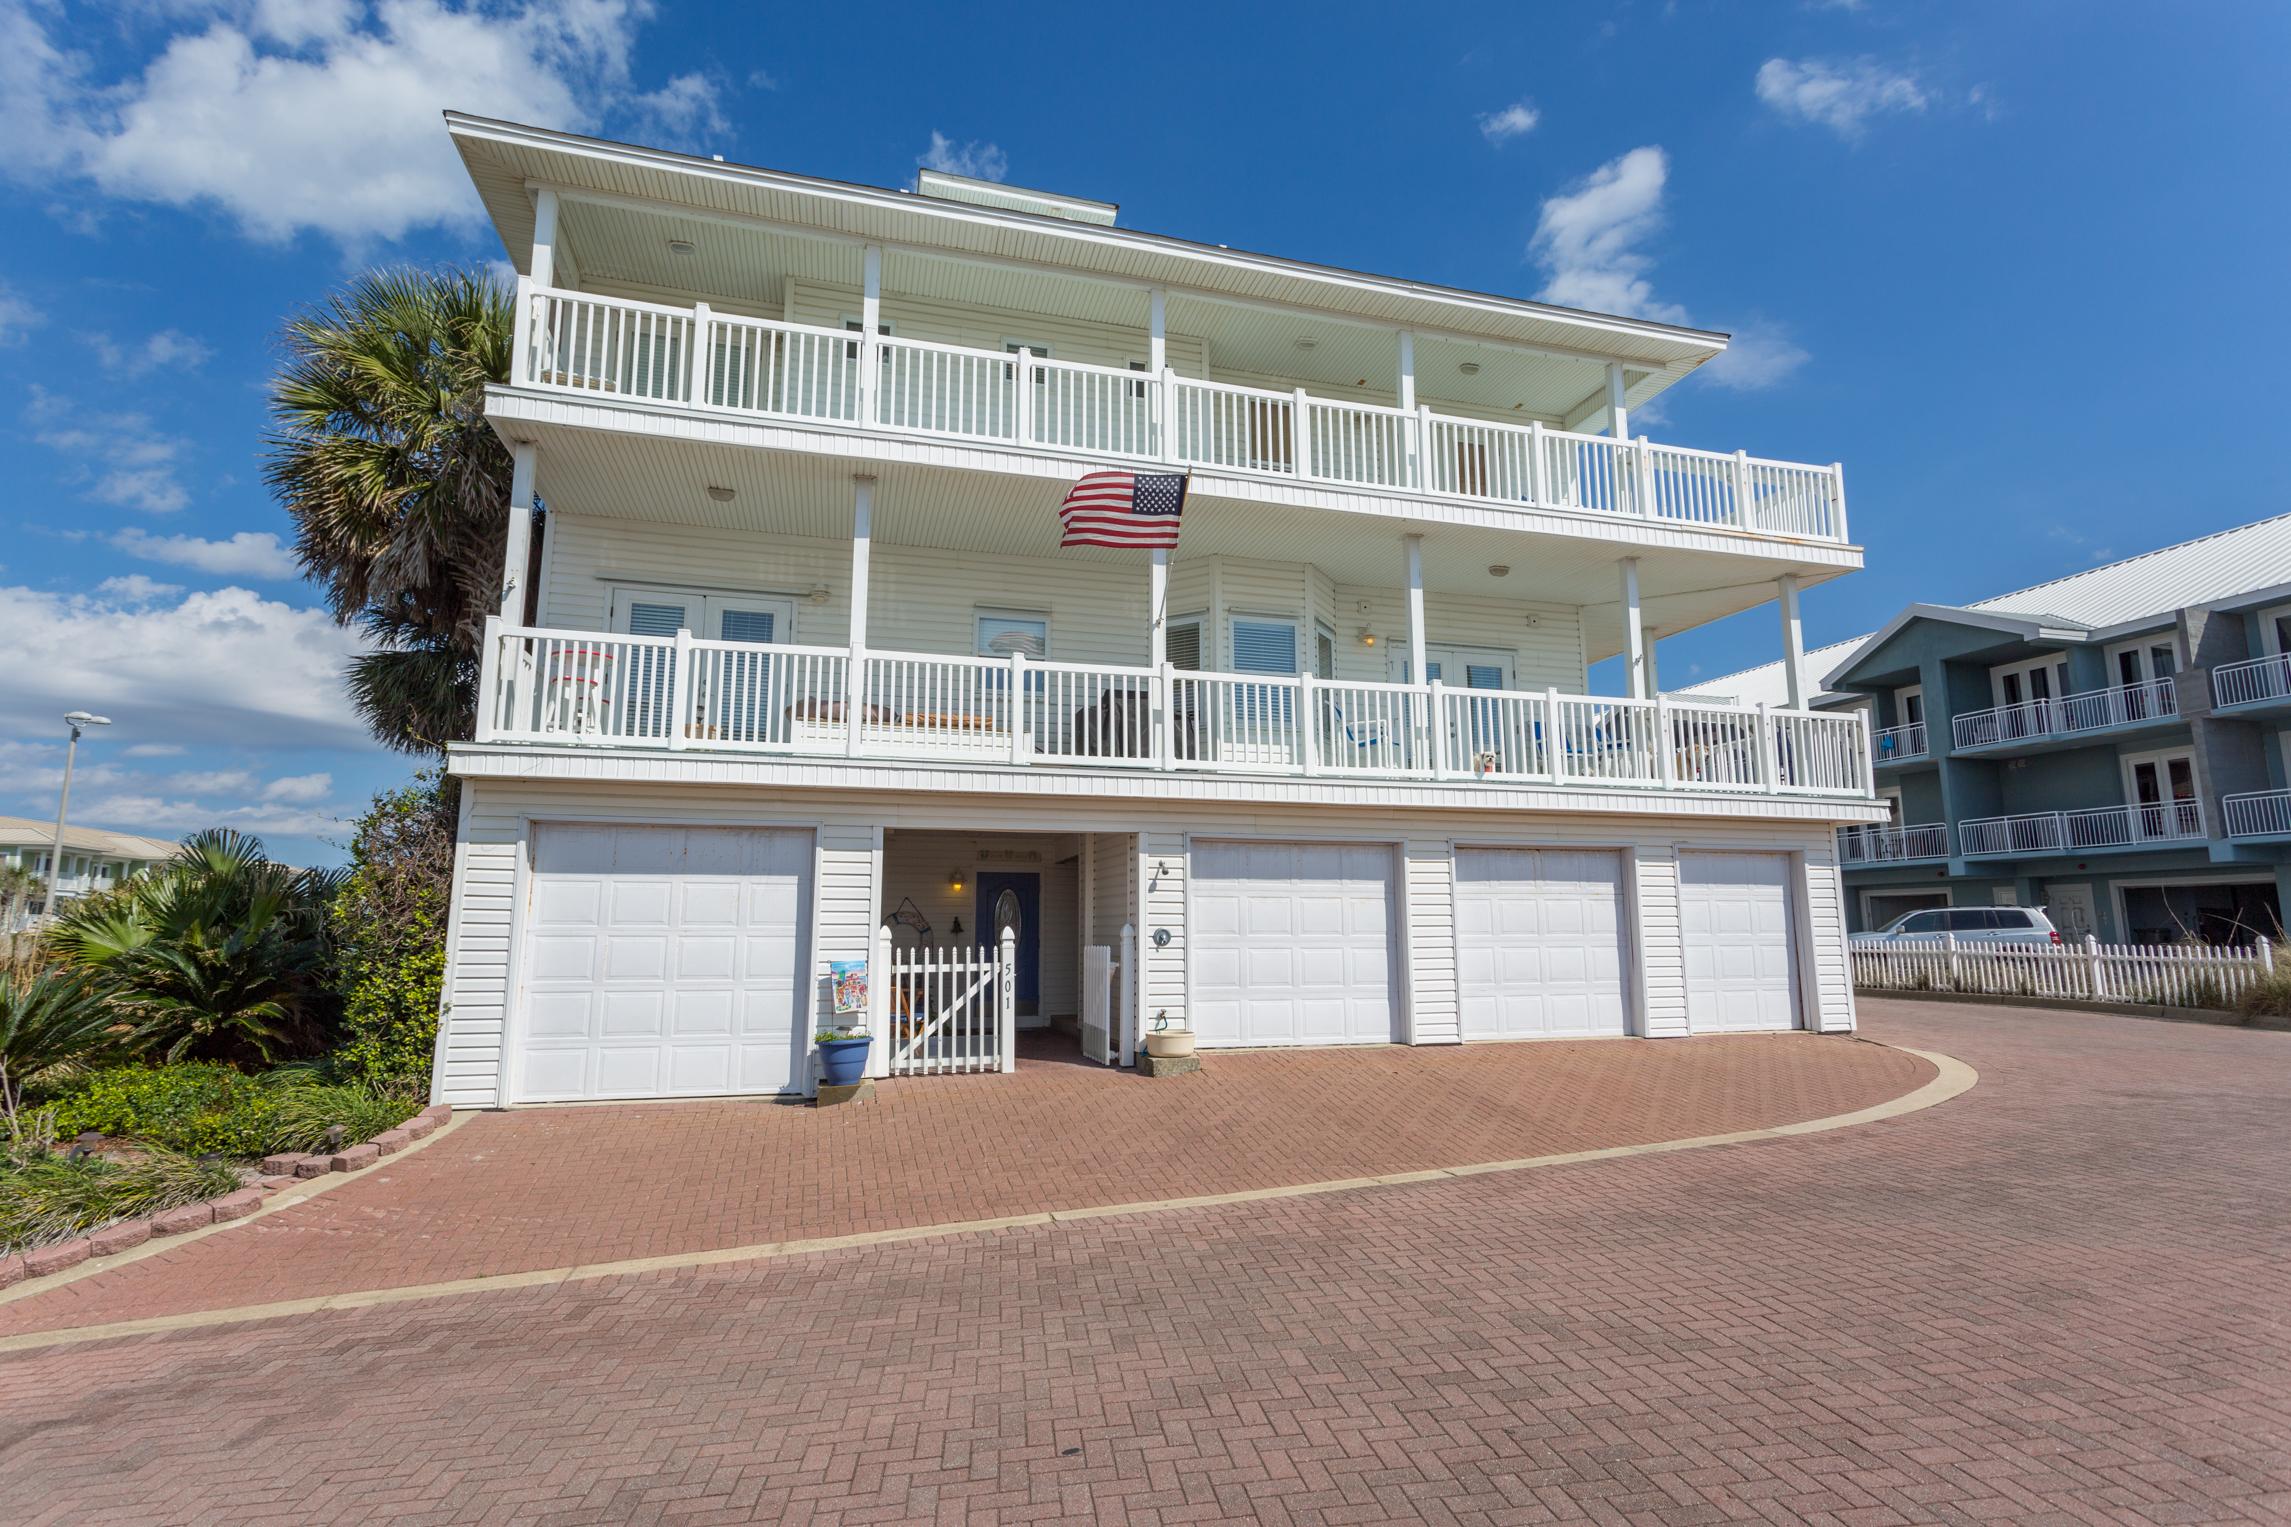 White Sands Cottage 501 Life's a Beach House Townhouse rental in White Sands Pensacola Beach in Pensacola Beach Florida - #44